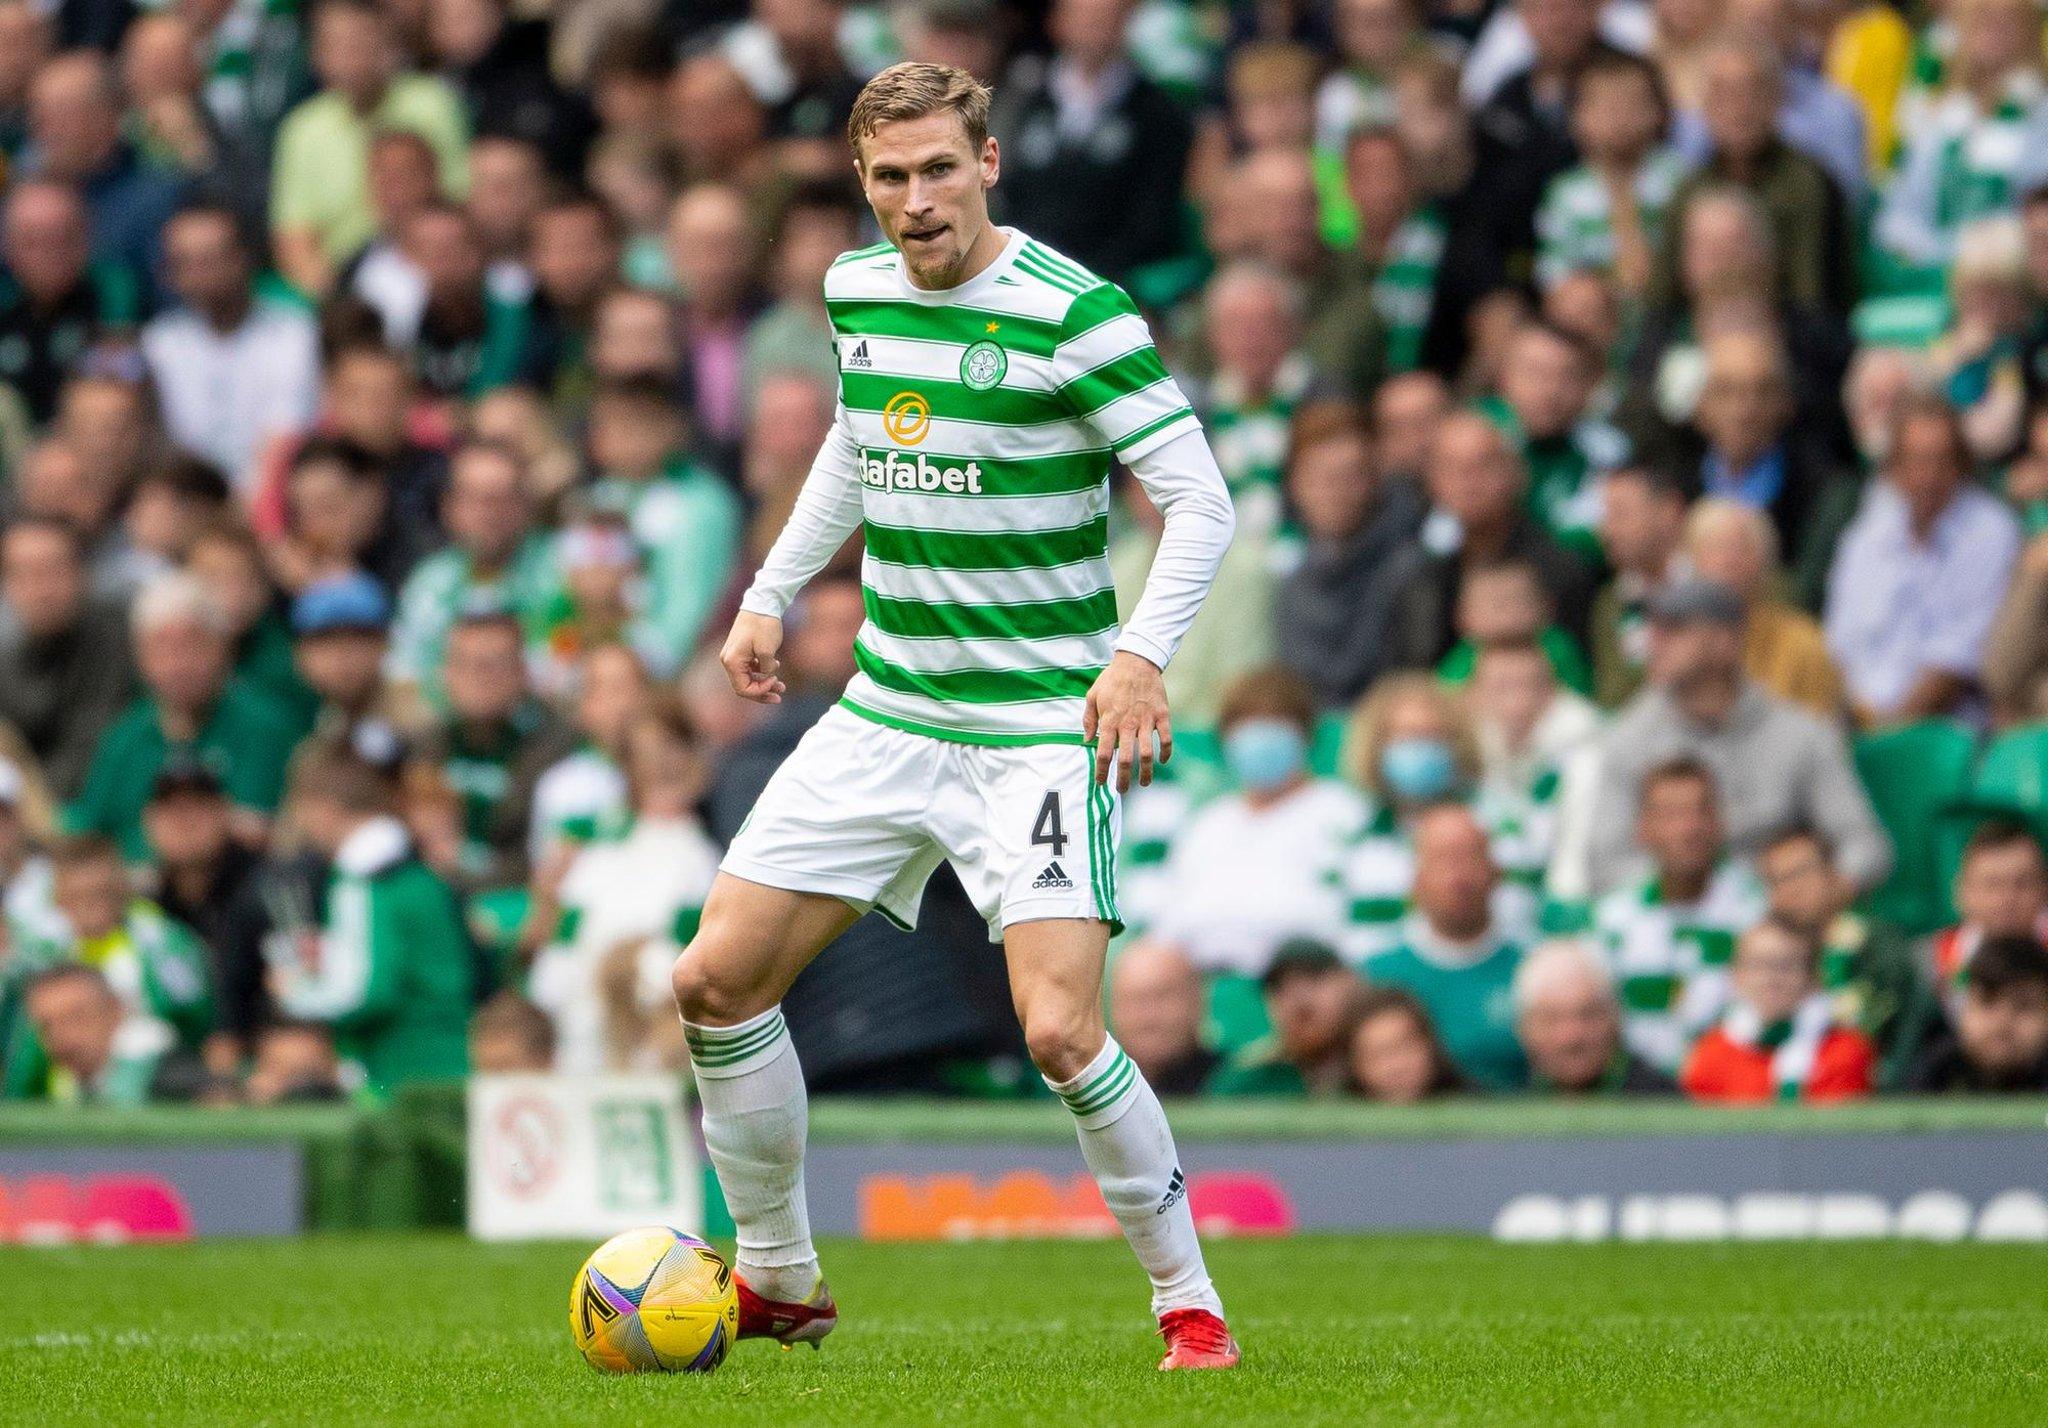 Carl Starfelt mengirim pesan ke pencela Celtic dan membuat pengakuan 'tidak 100 persen senang'